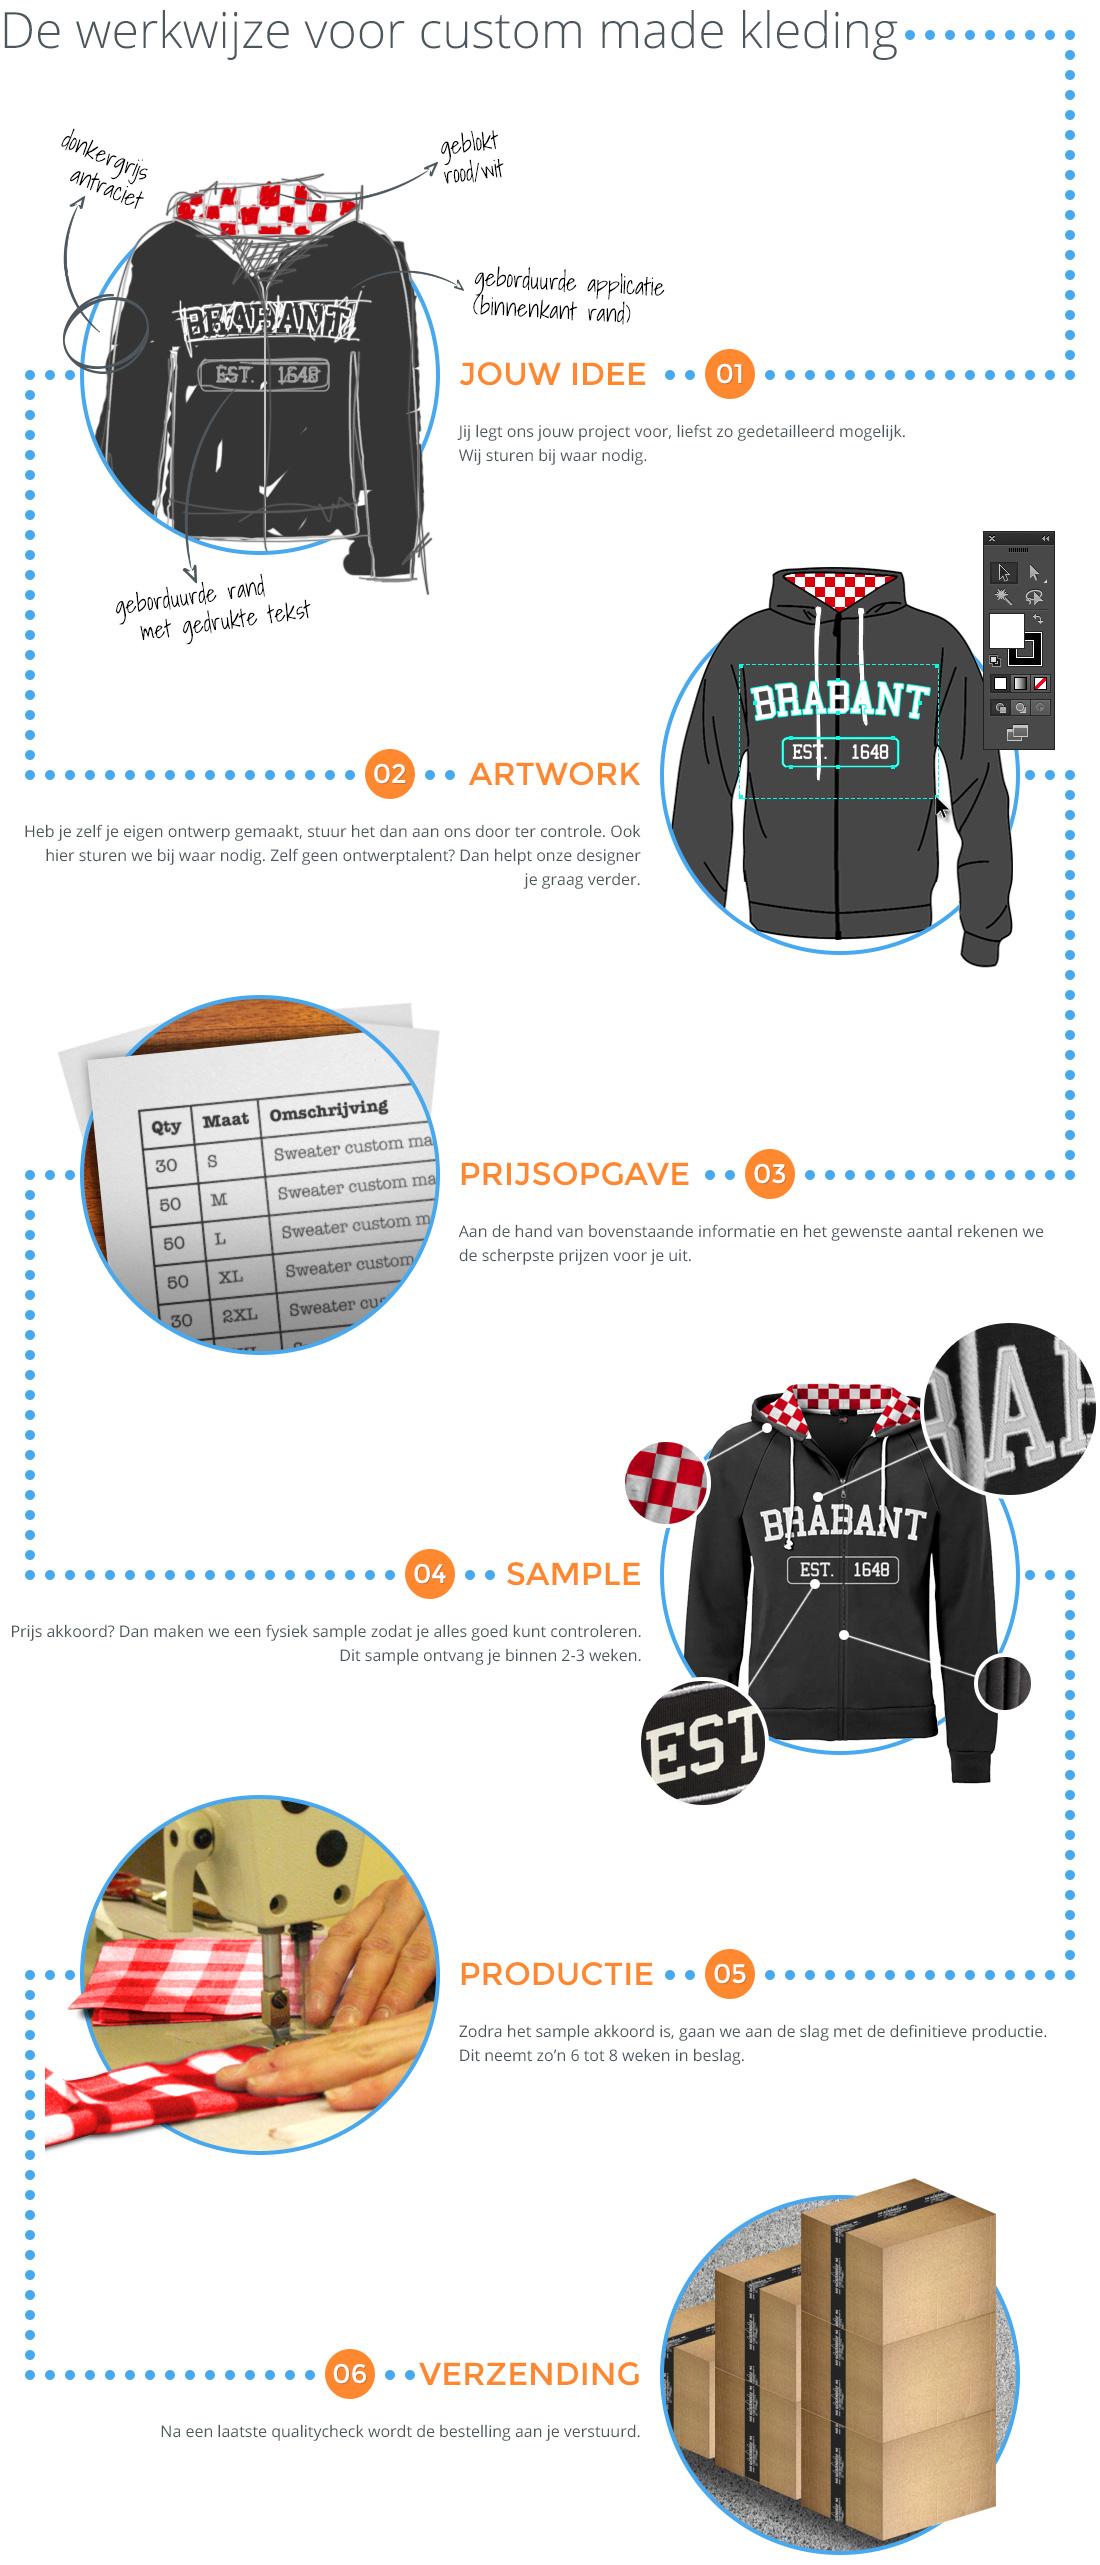 Beschrijving werkwijze custom made kleding